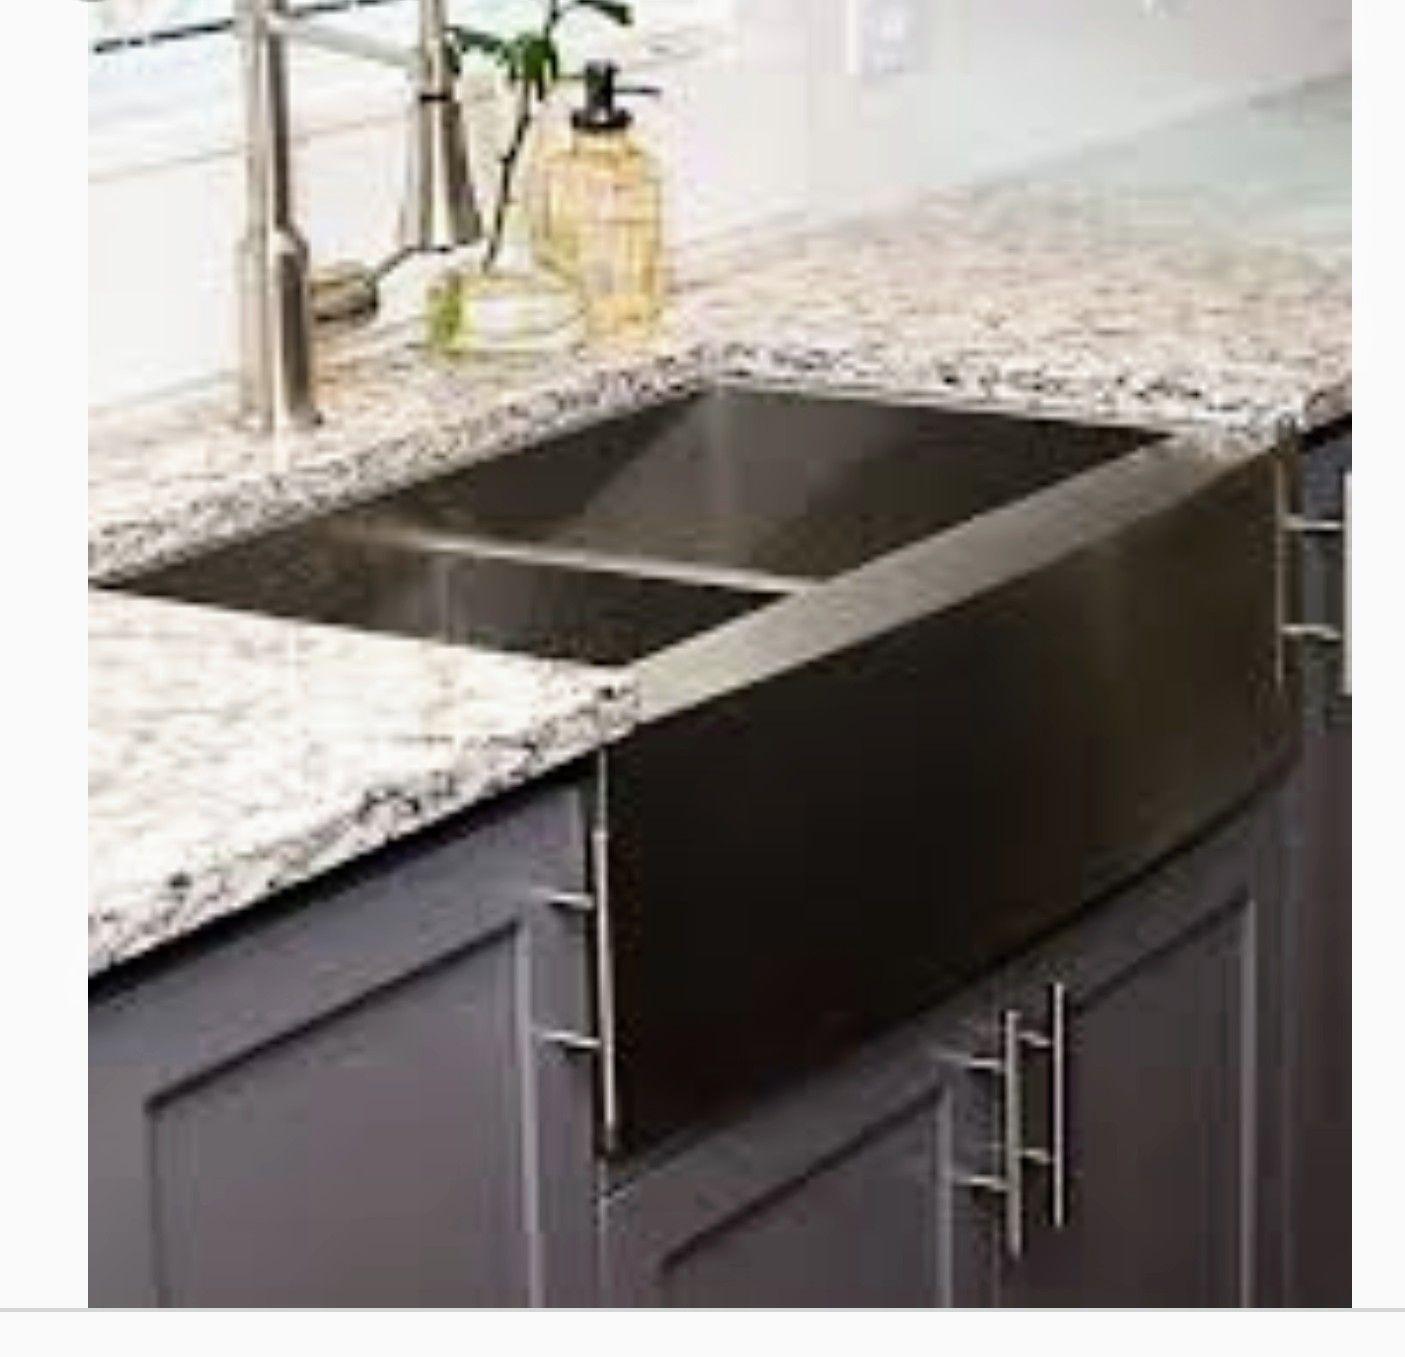 Black Stainless Steel Farm Sink Stainless Farmhouse Sink